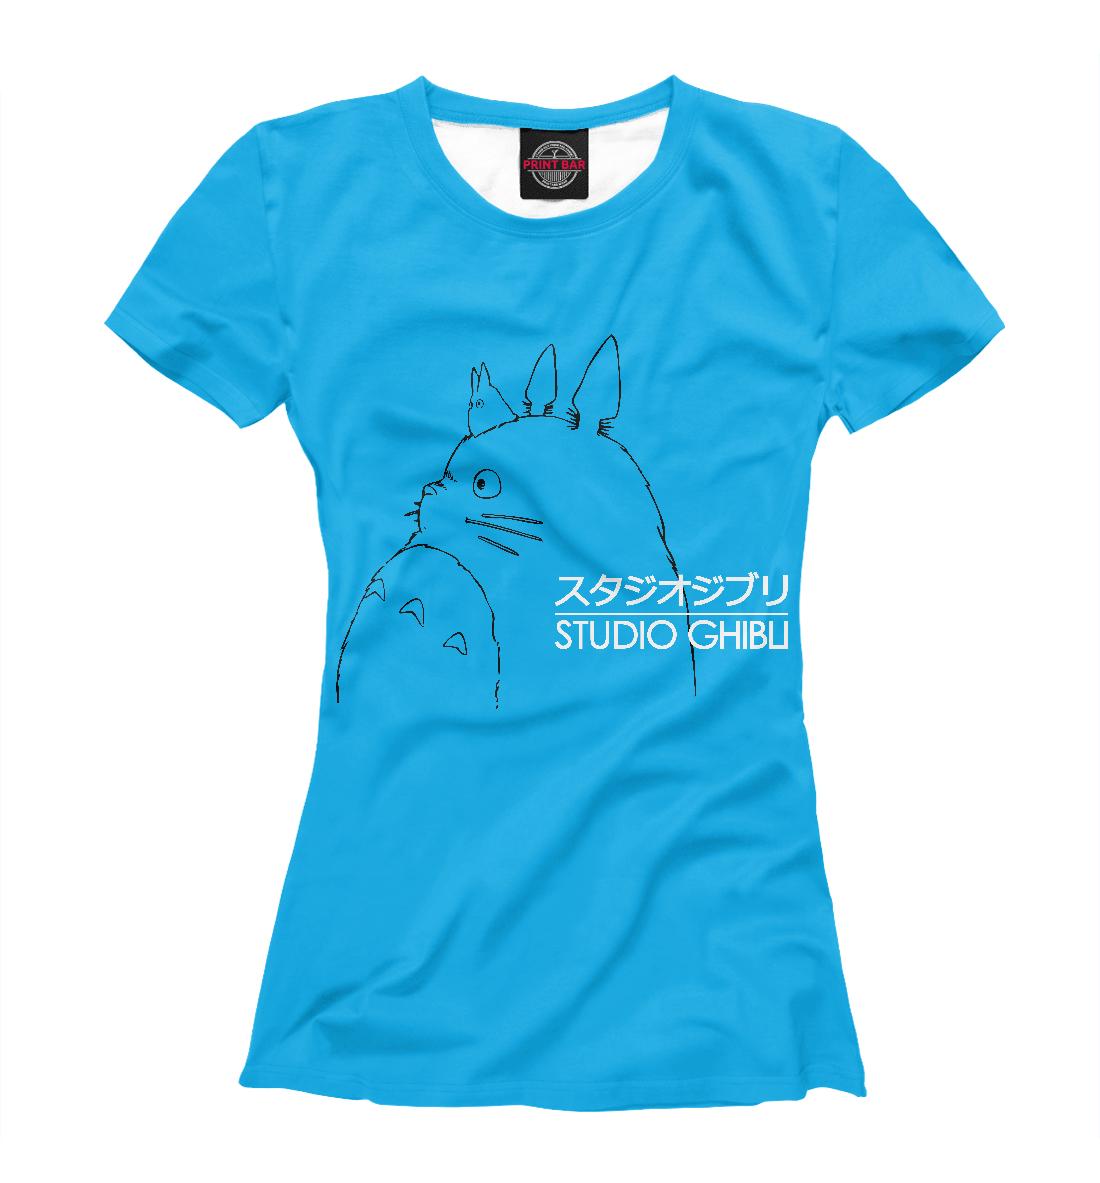 Купить Studio Ghibli, Printbar, Футболки, SGH-613802-fut-1